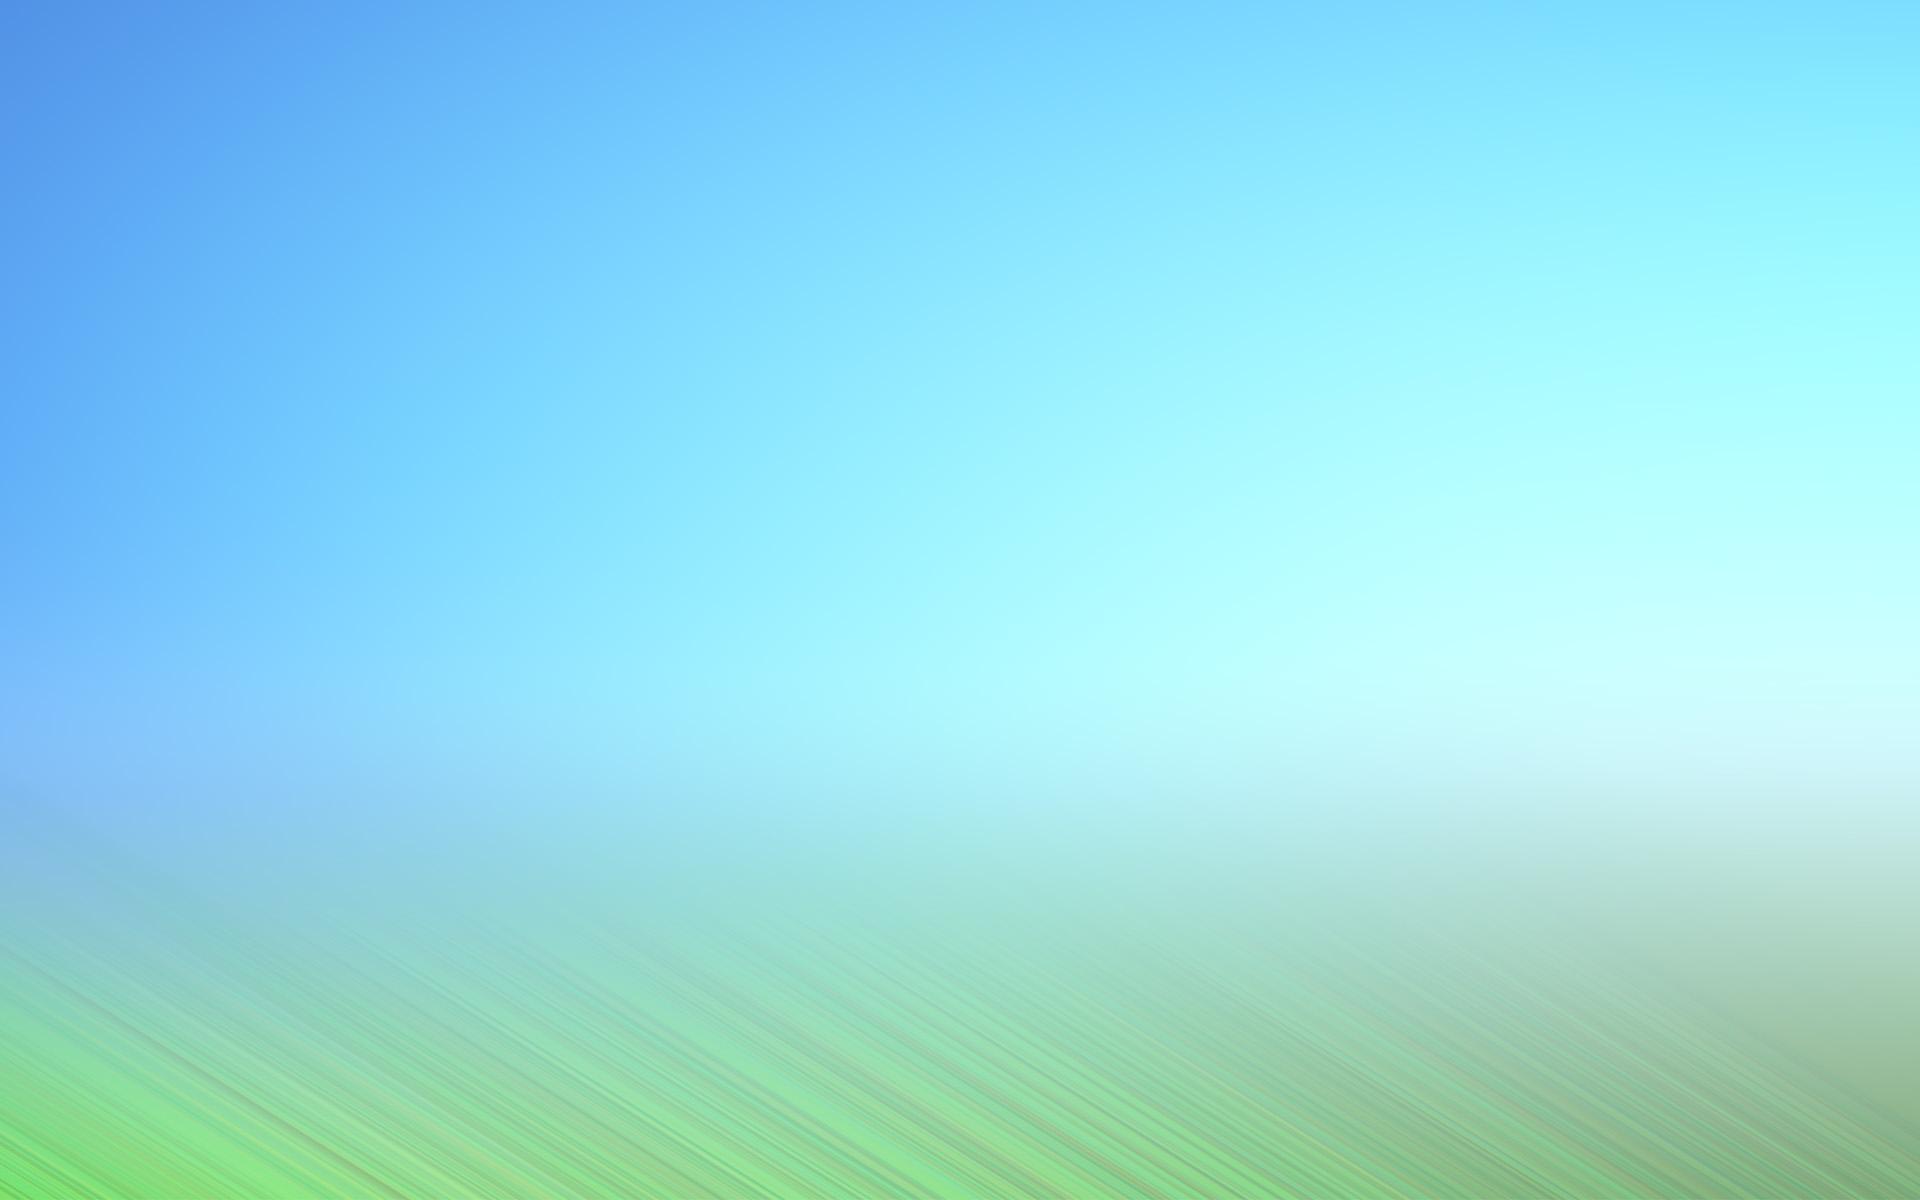 green blue white wallpaper - photo #9